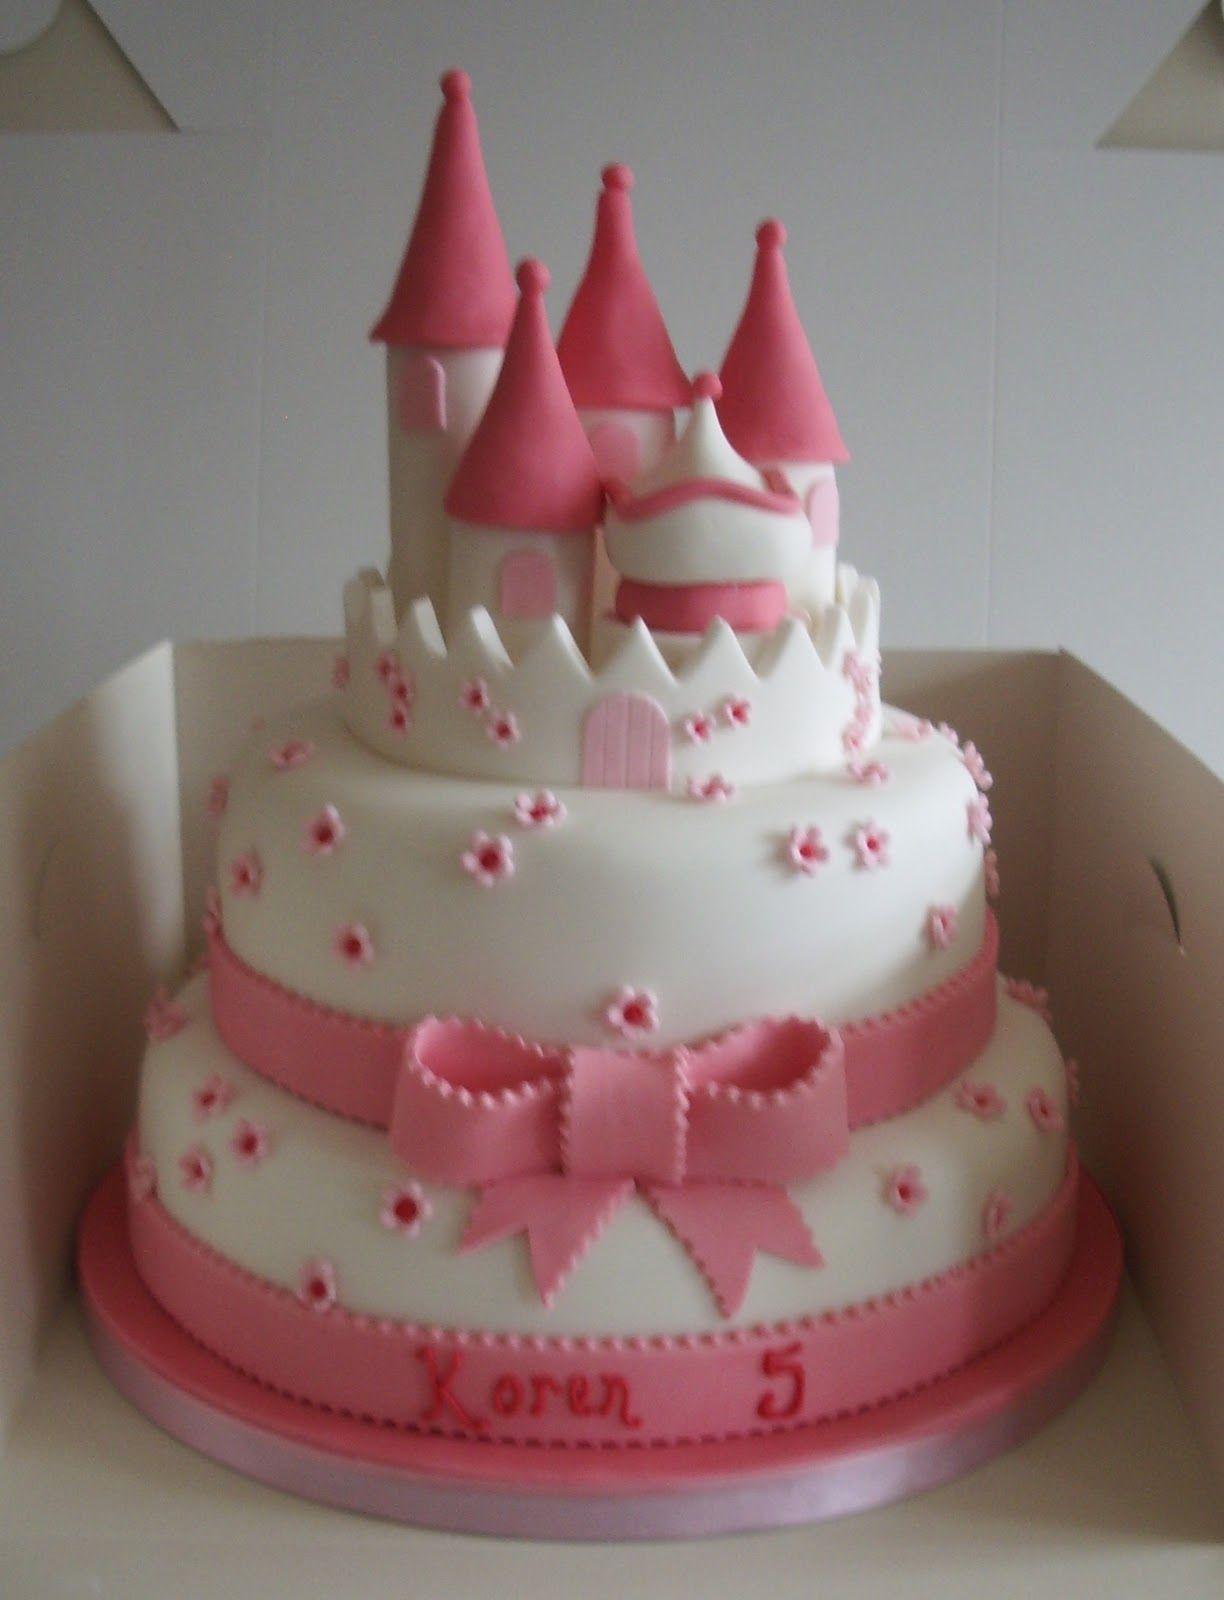 Tellastella Tella S Tella Top 10 Bolos Decorados Para Princesas